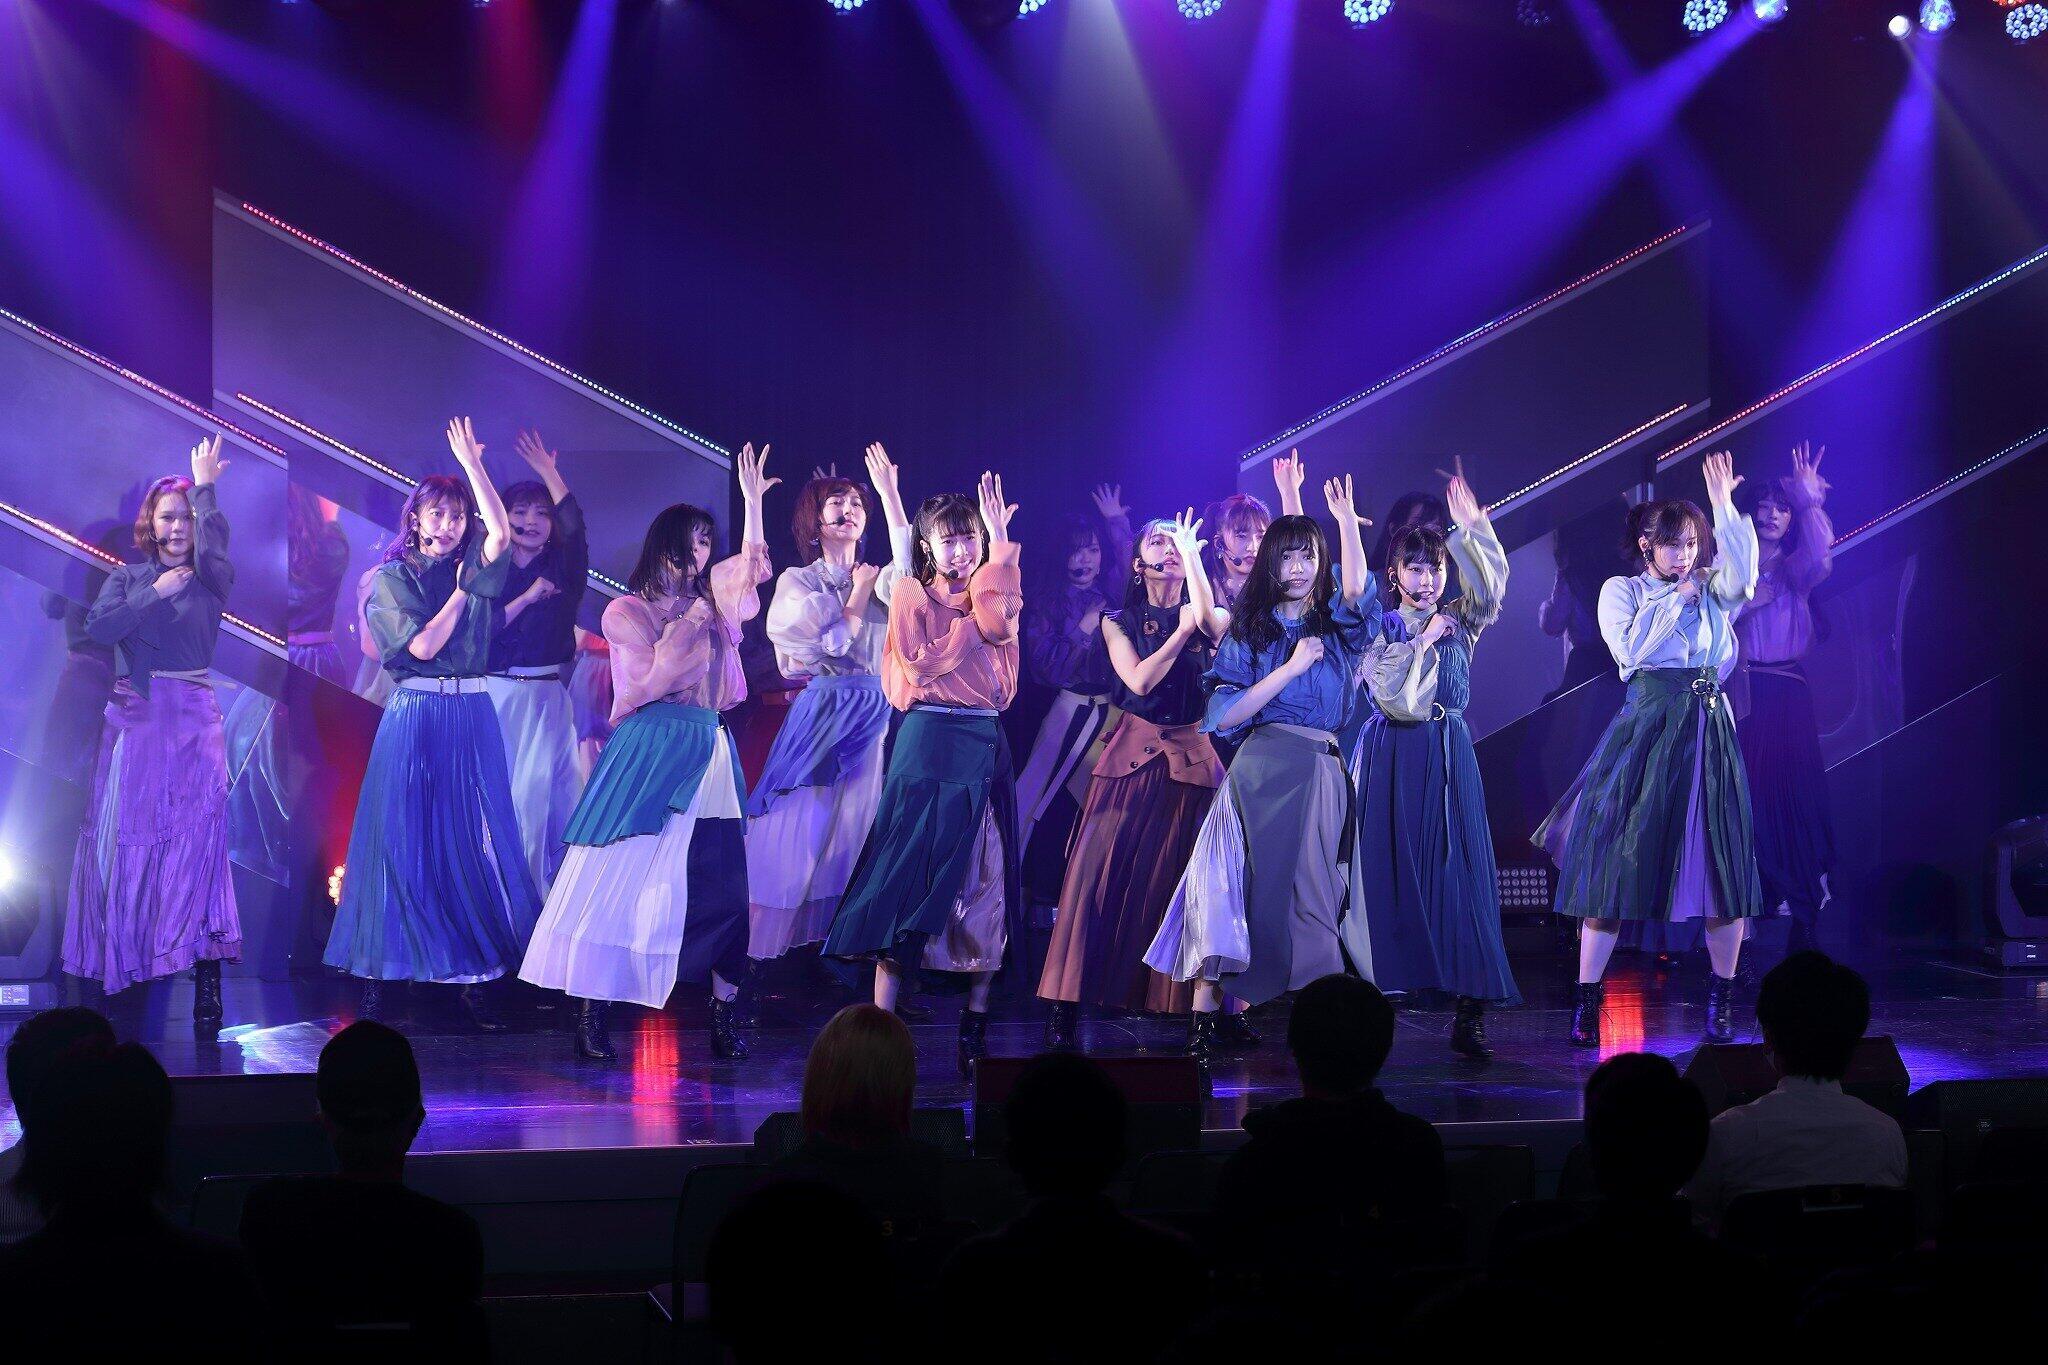 HKT48、専用劇場「復活」と変わる福岡の景色 10年目へ向け「たくさんの人を笑顔に」